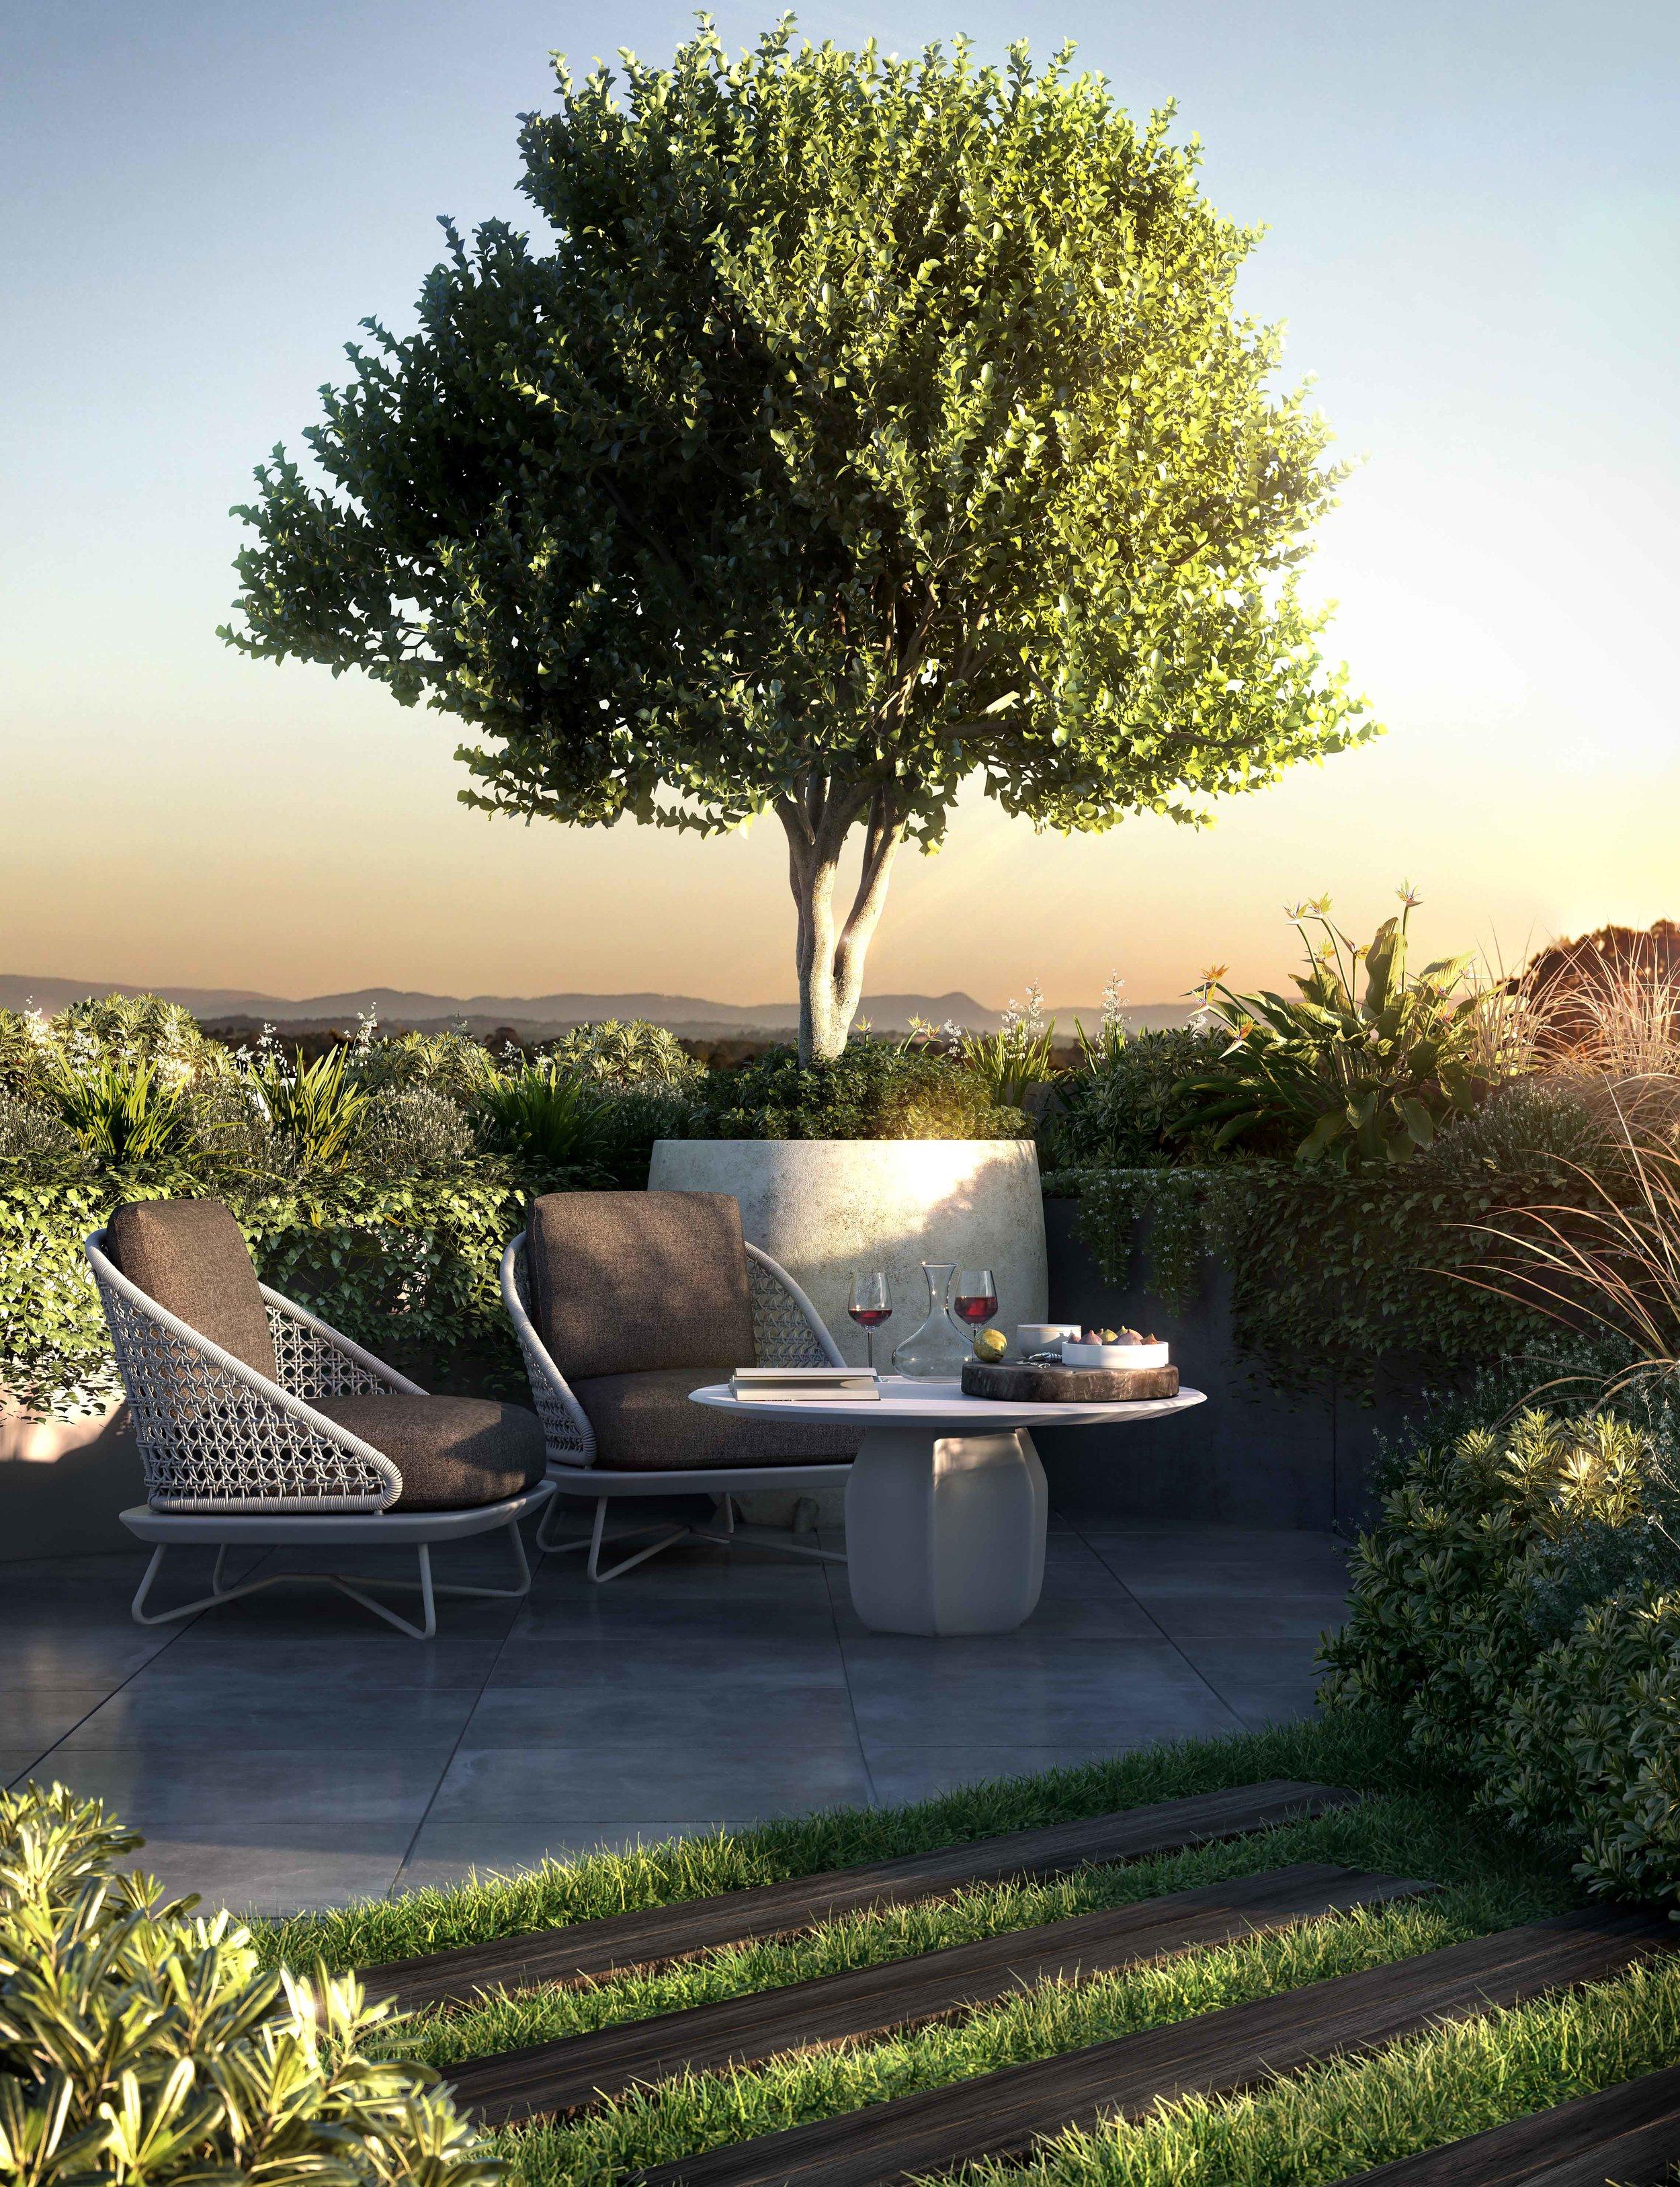 M&P_Amenity_Rooftop Garden Detail-resize.jpg